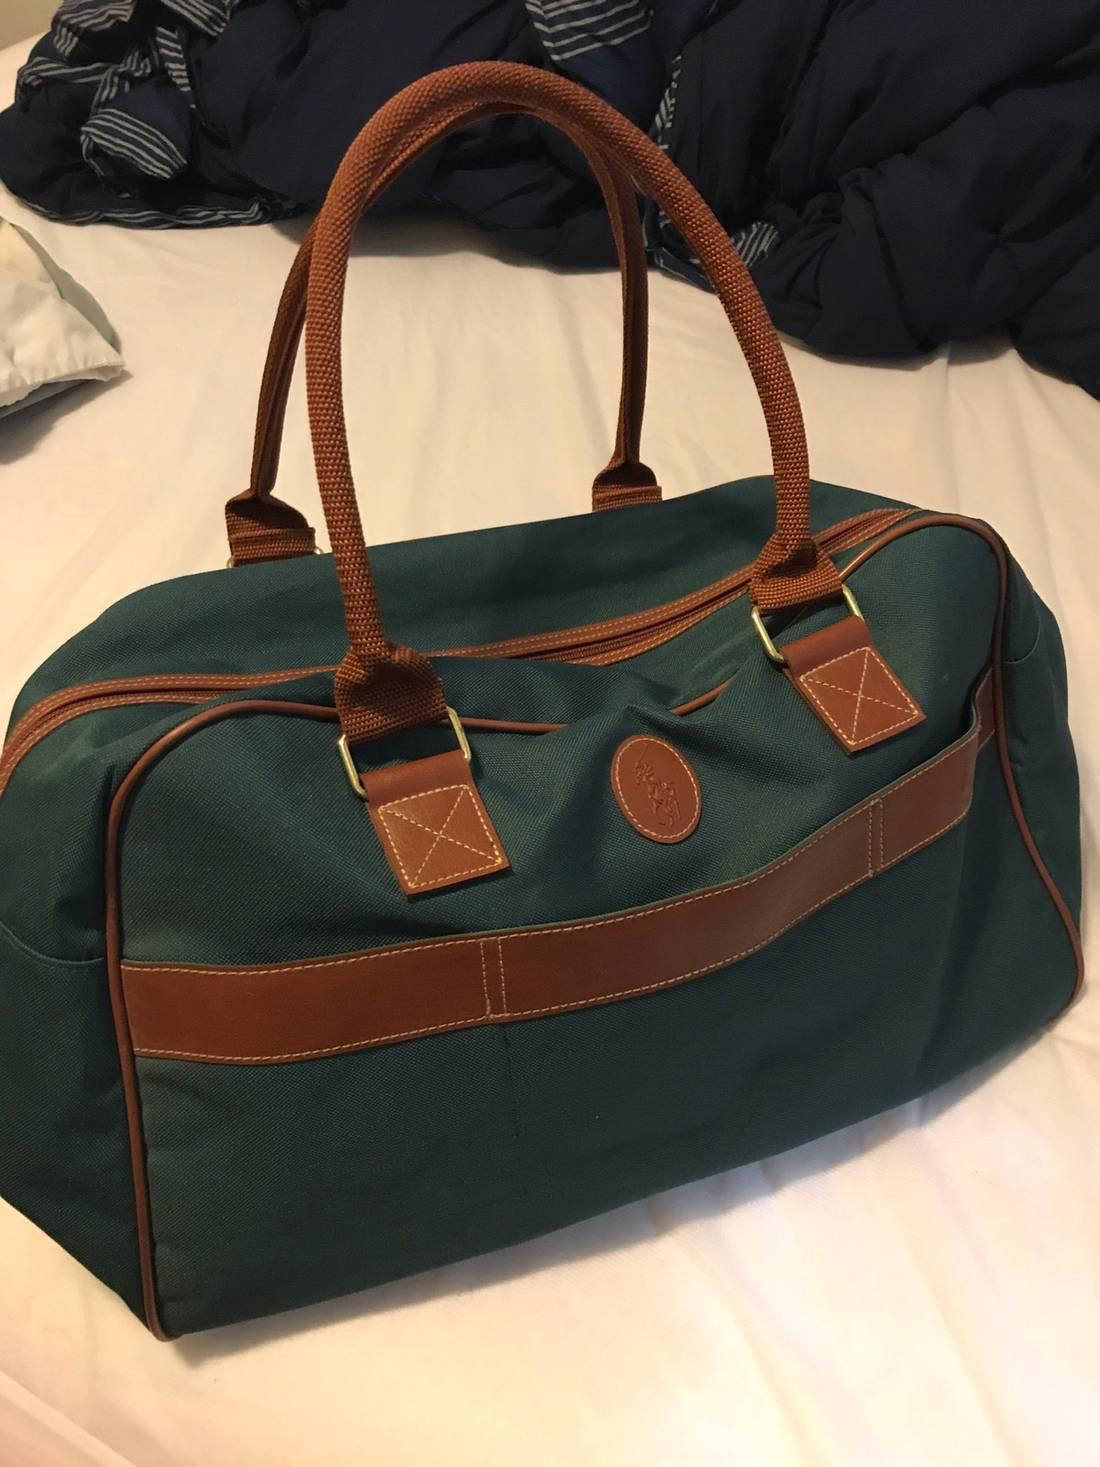 9dd4d722b9f Polo Ralph Lauren Leather Duffel Bag   ReGreen Springfield